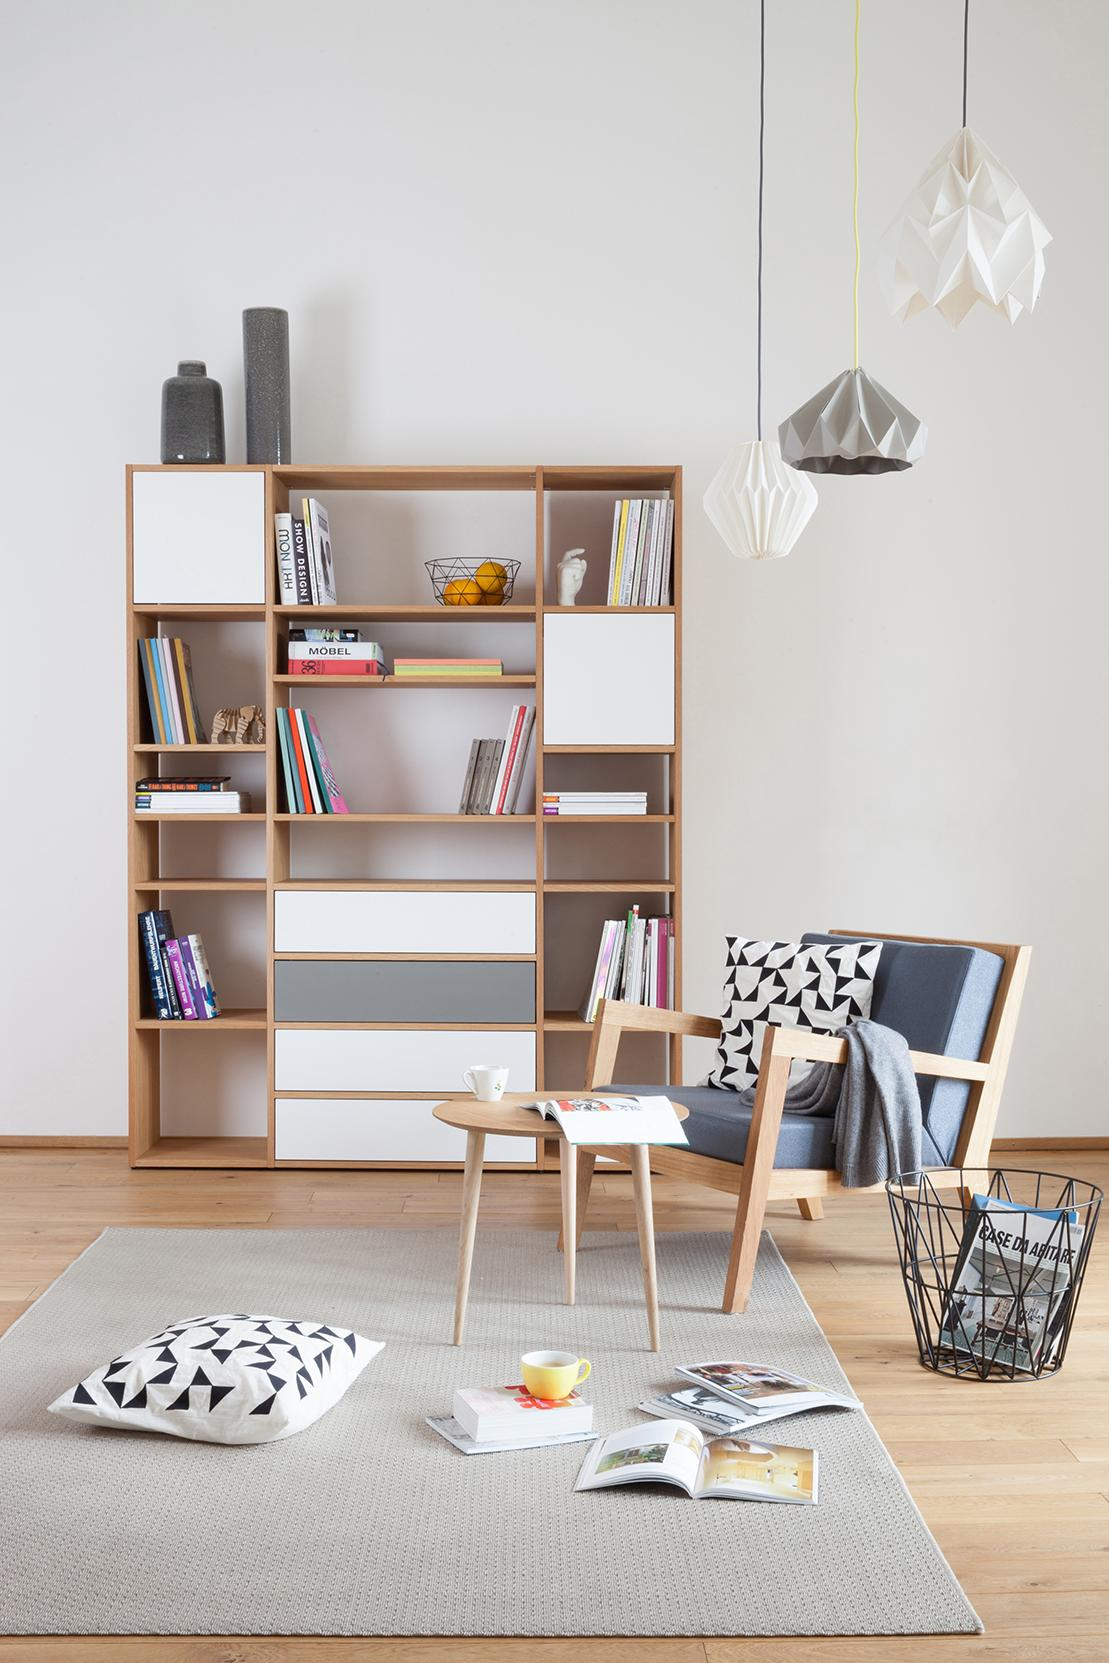 bibliothek bilder ideen couchstyle. Black Bedroom Furniture Sets. Home Design Ideas